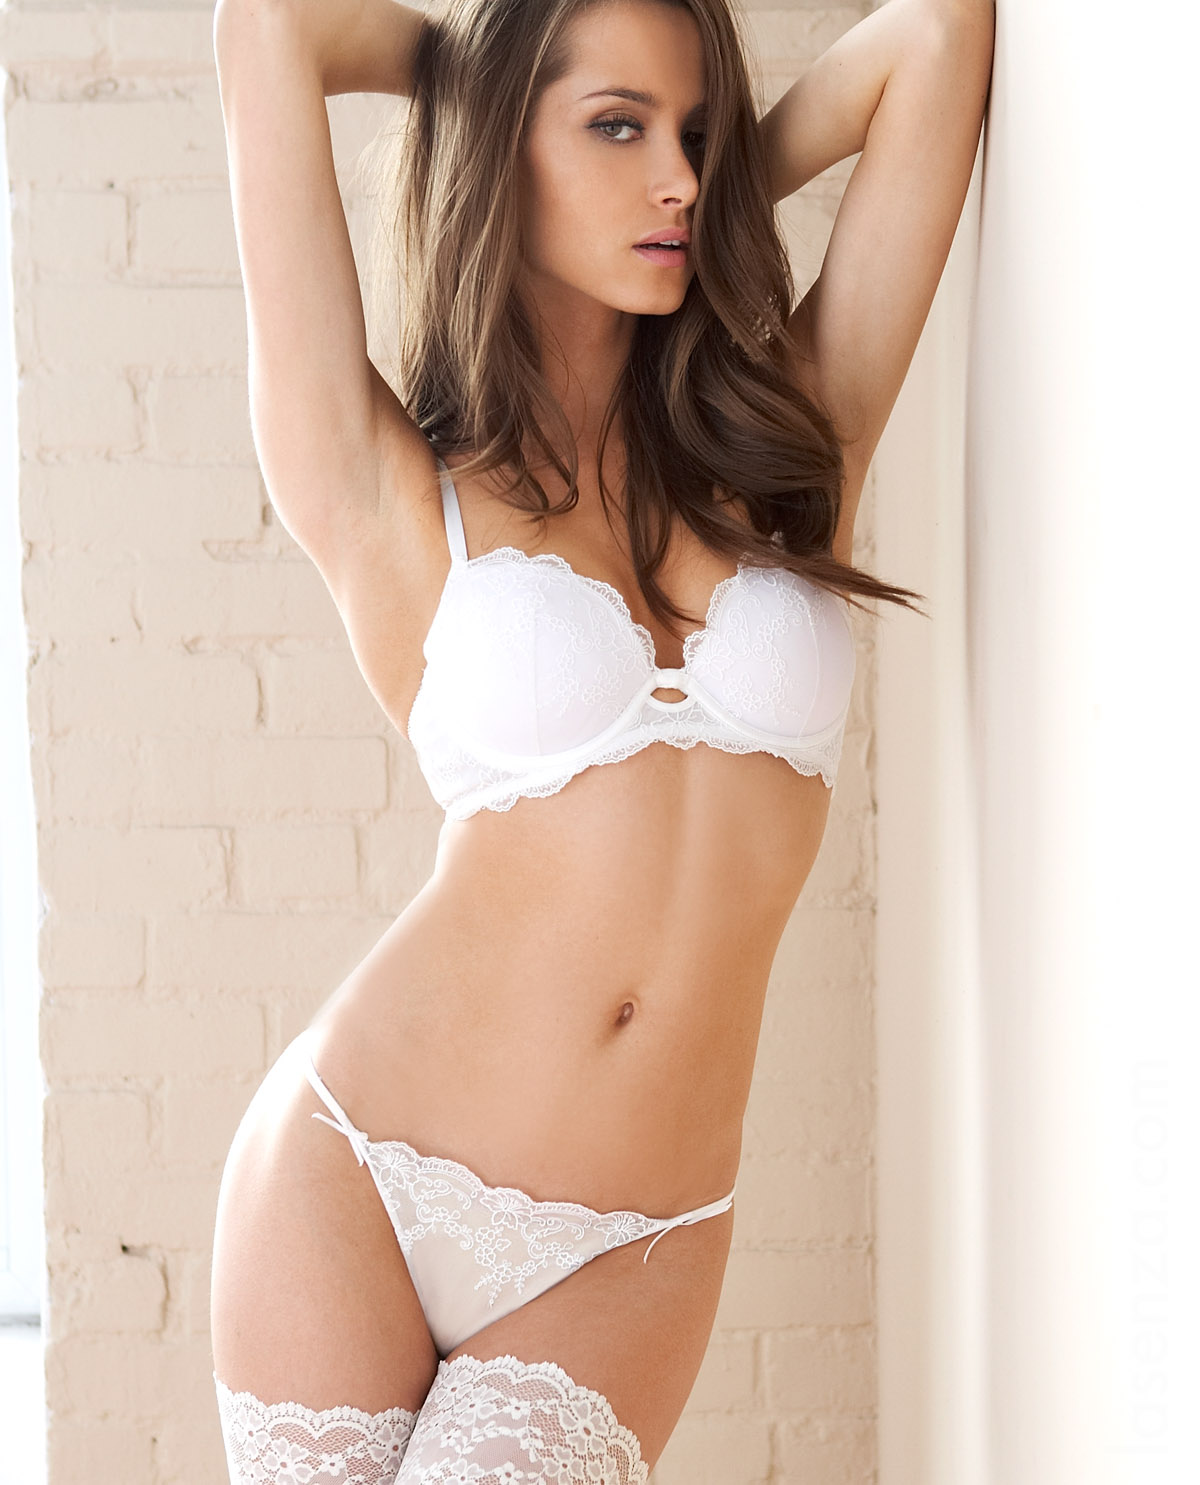 lingerie Eva angelina